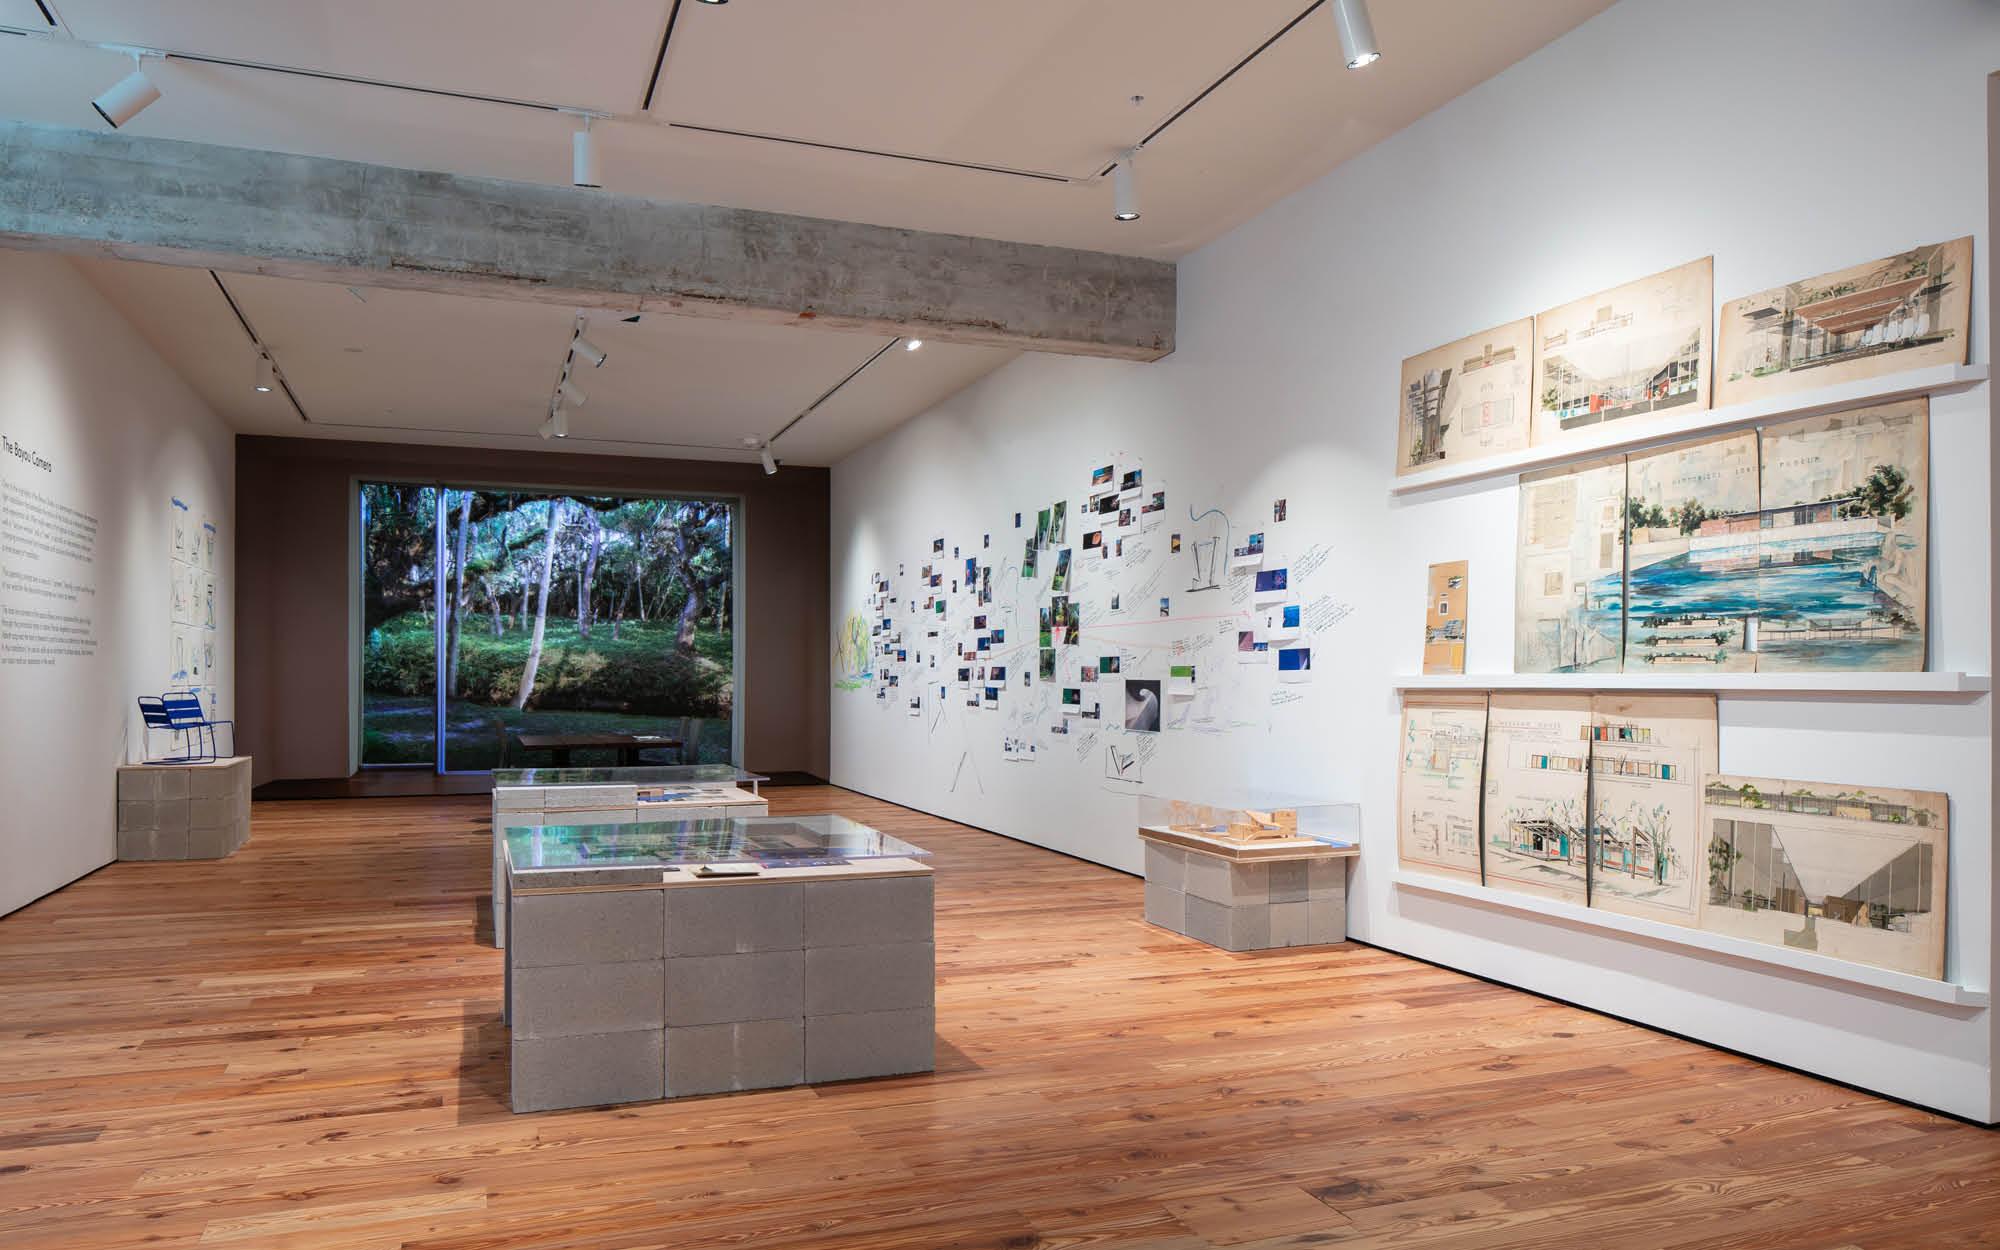 Carl Abbott, The Bayou Studio at Sarasota Art Museum 2021